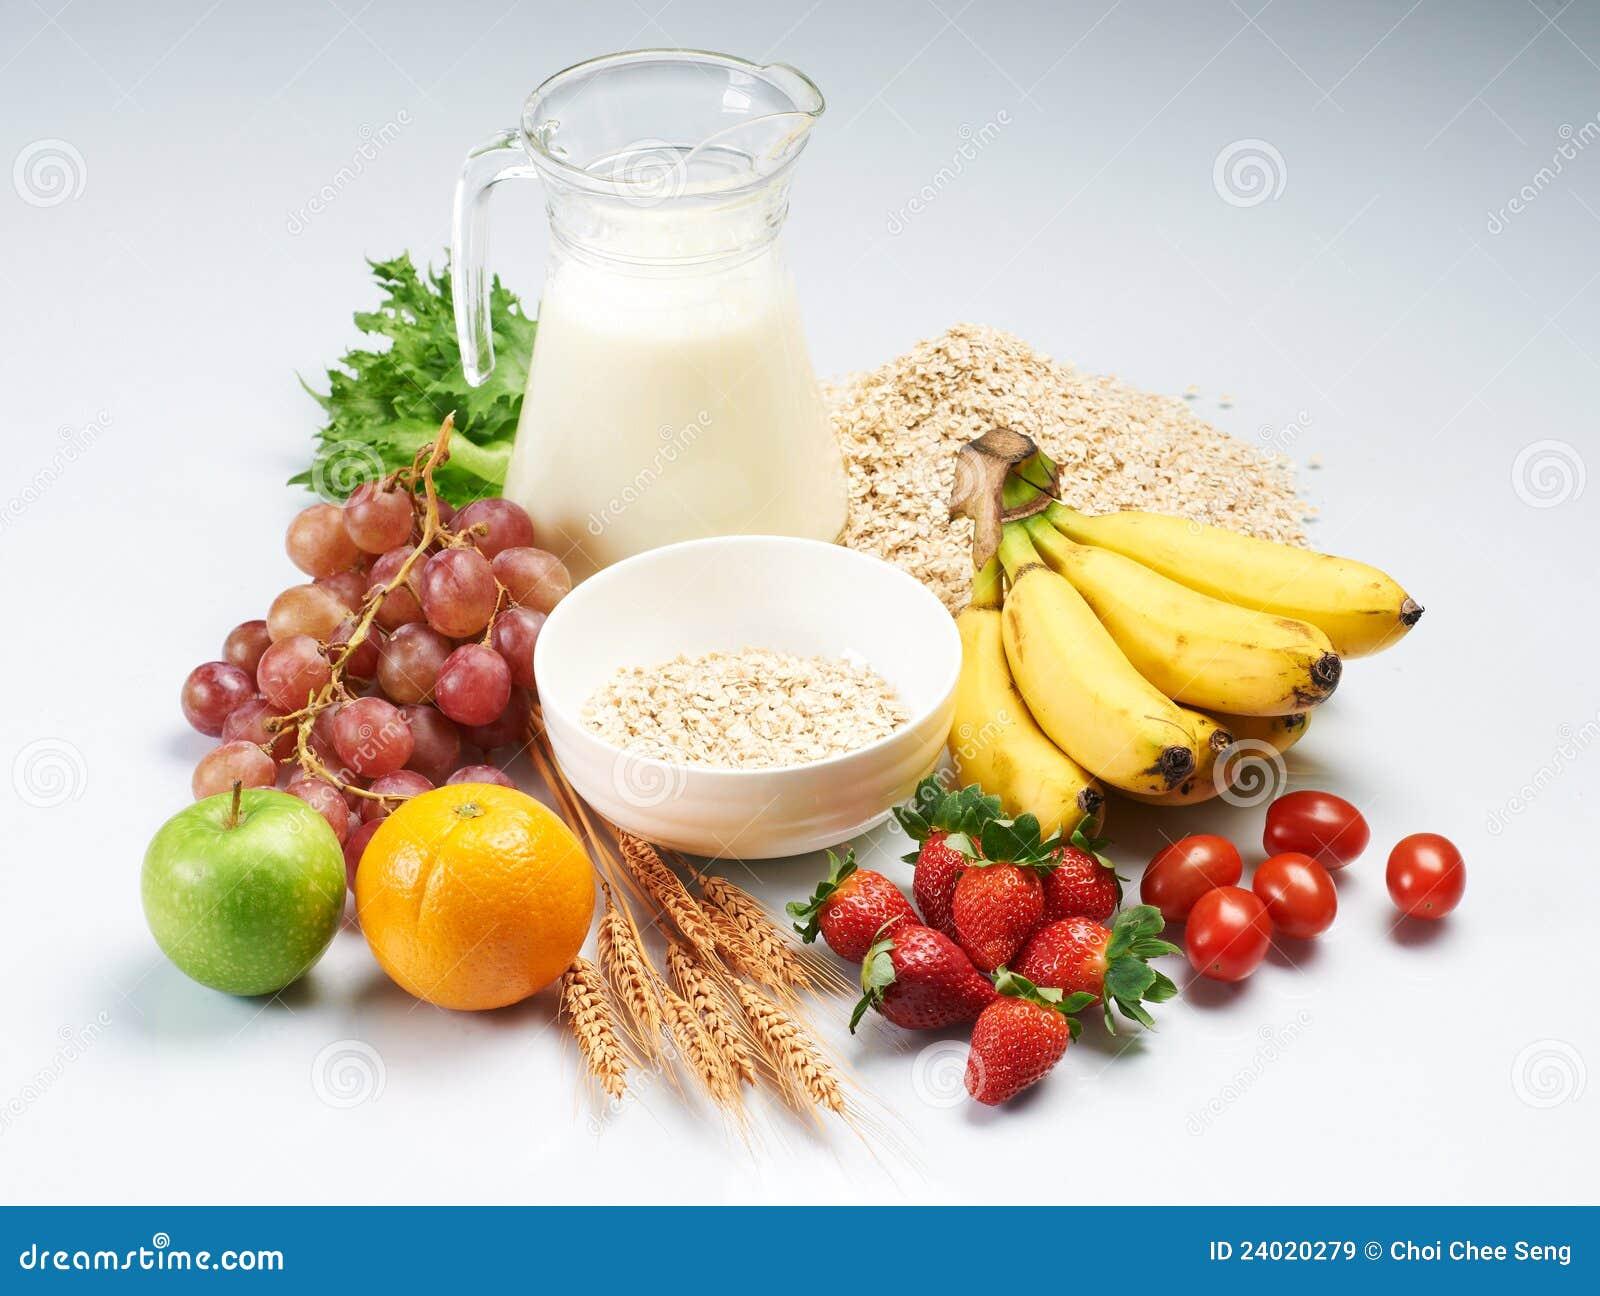 Organic Raw Food Diet Plan